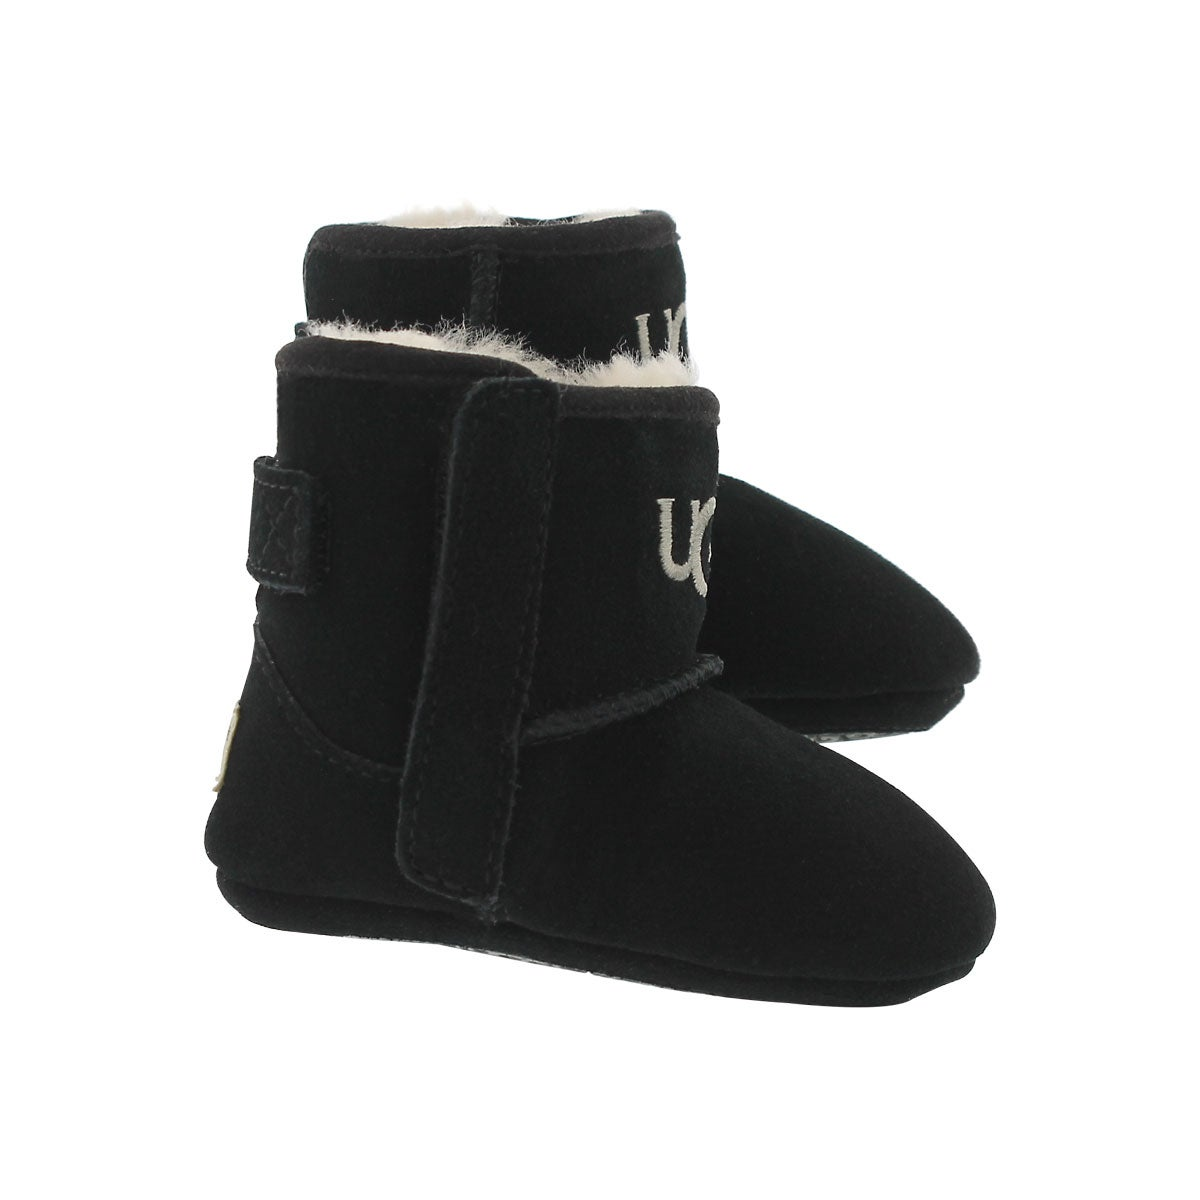 Inf-g Jesse II black fashion boot